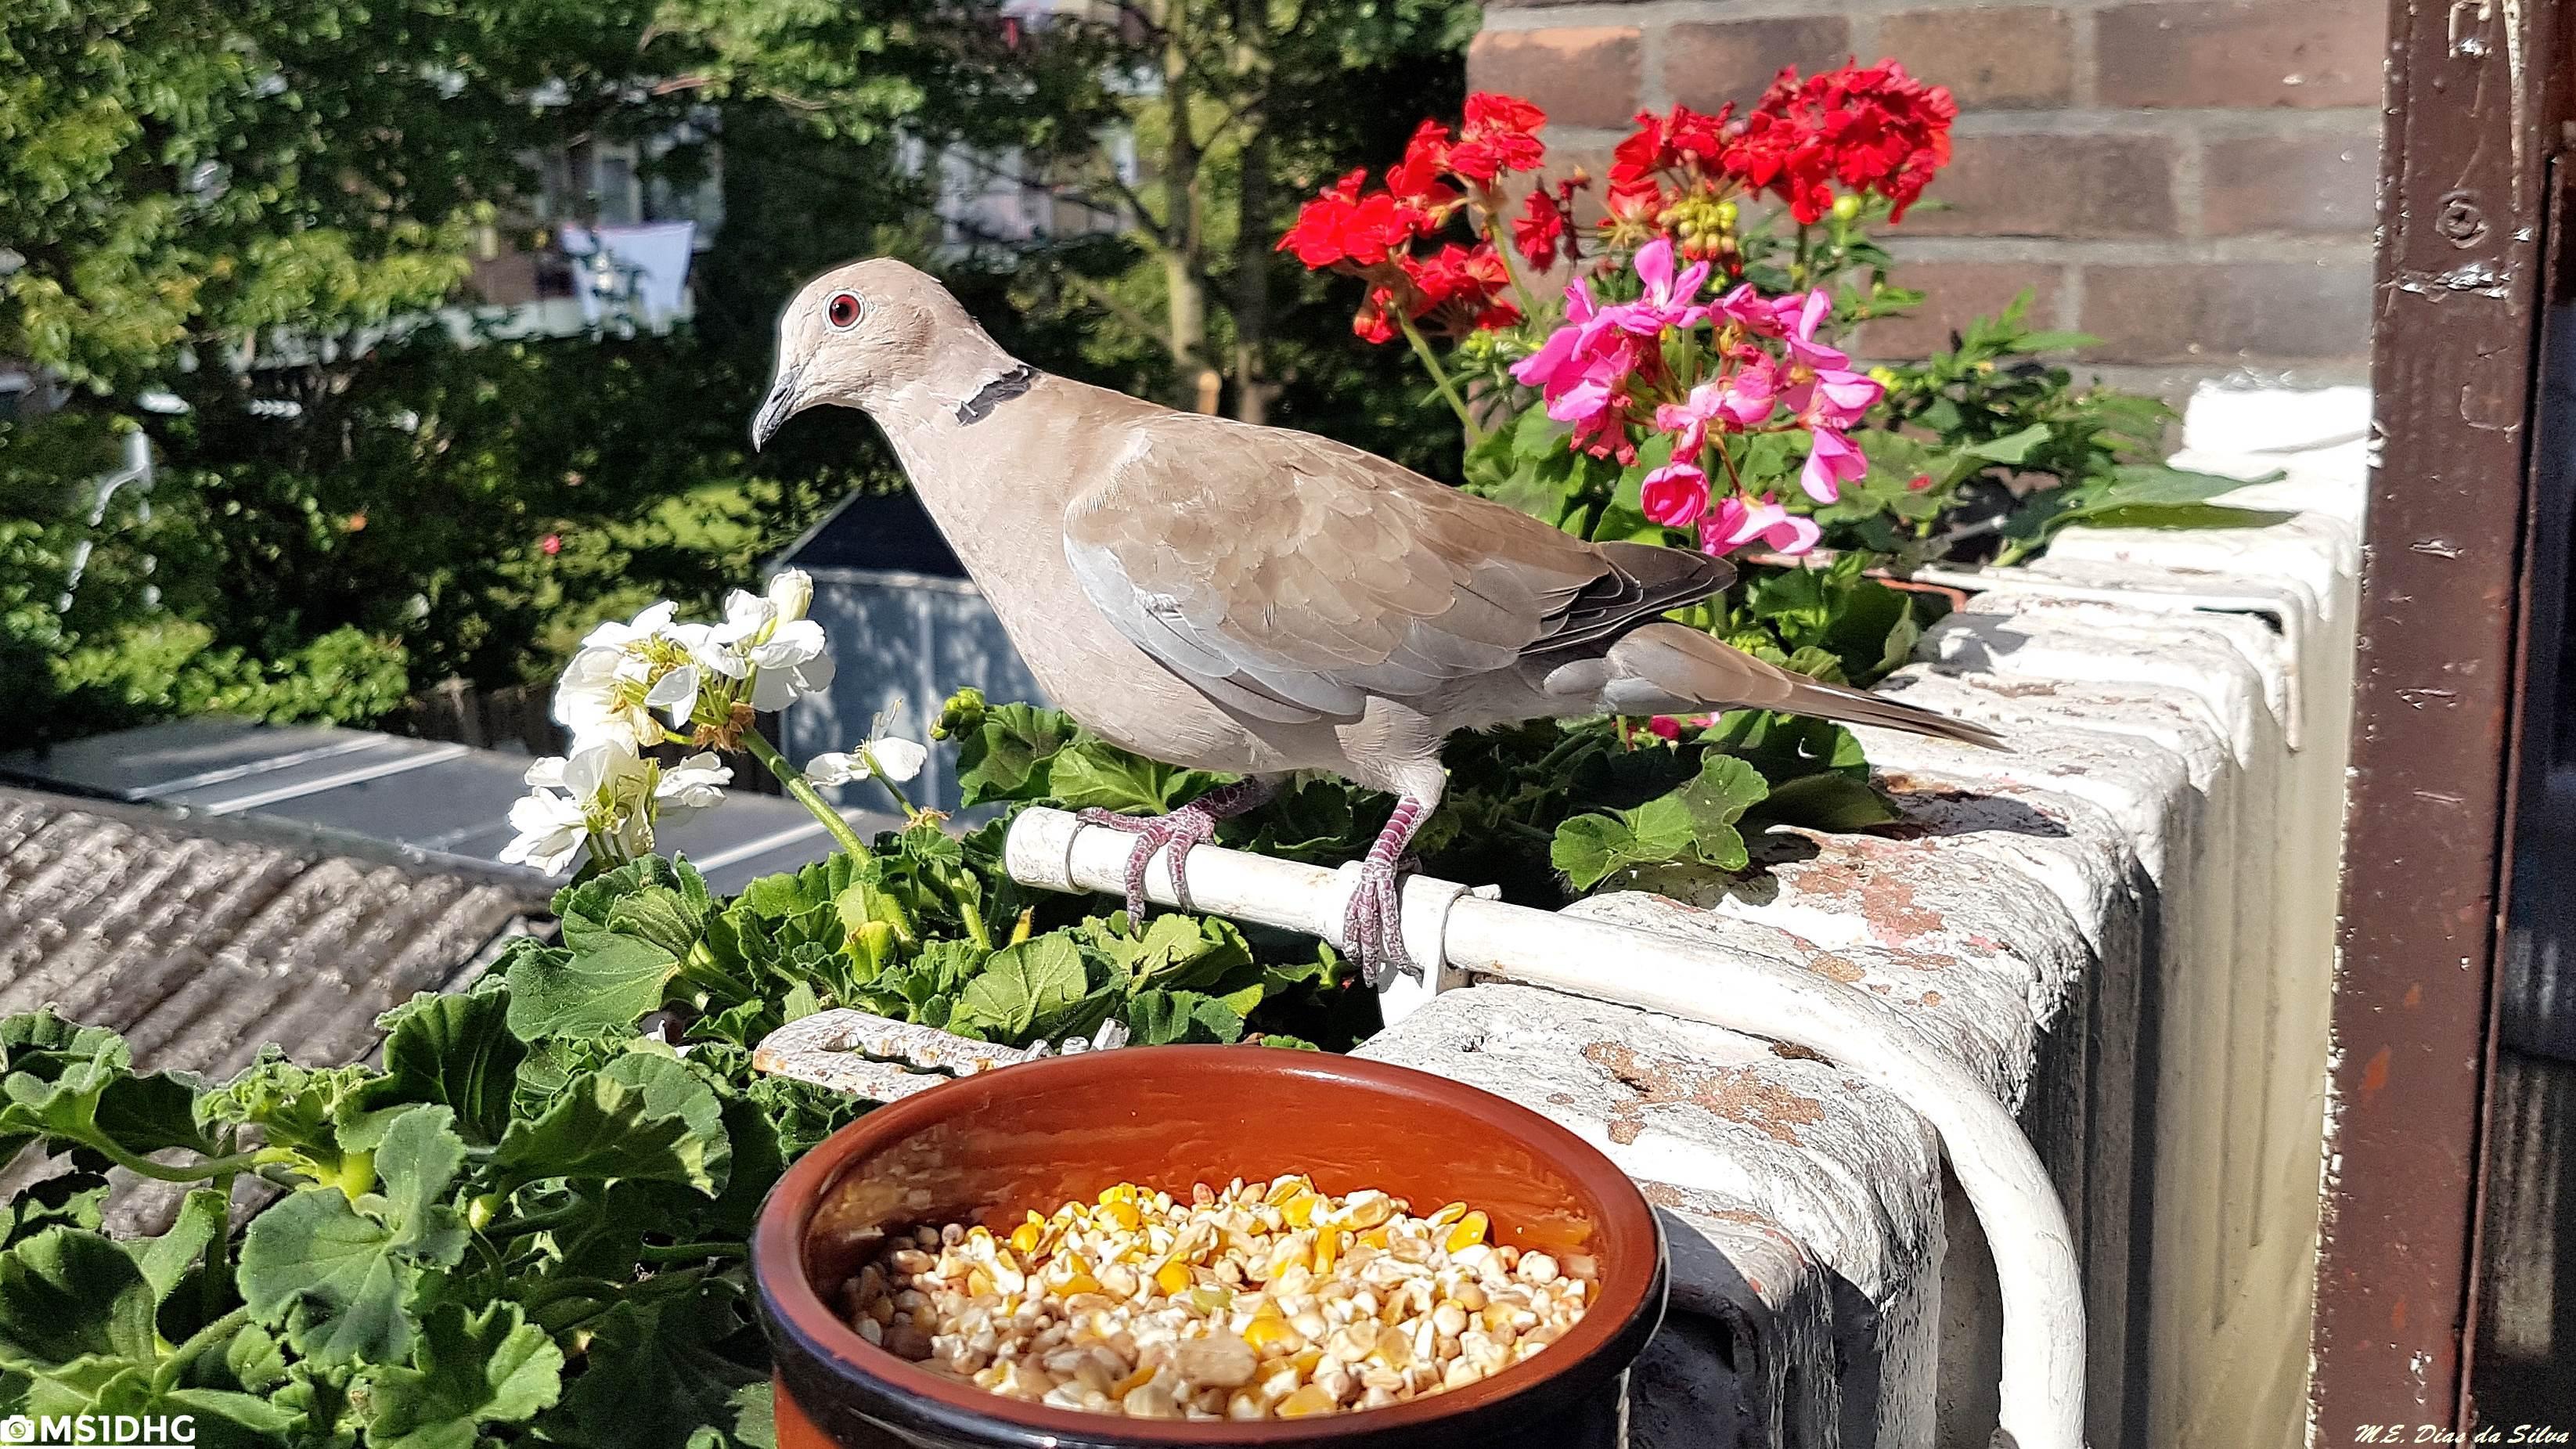 Fórum Aves - Birdwatching em Portugal - Portal Rola-turca%20(59)